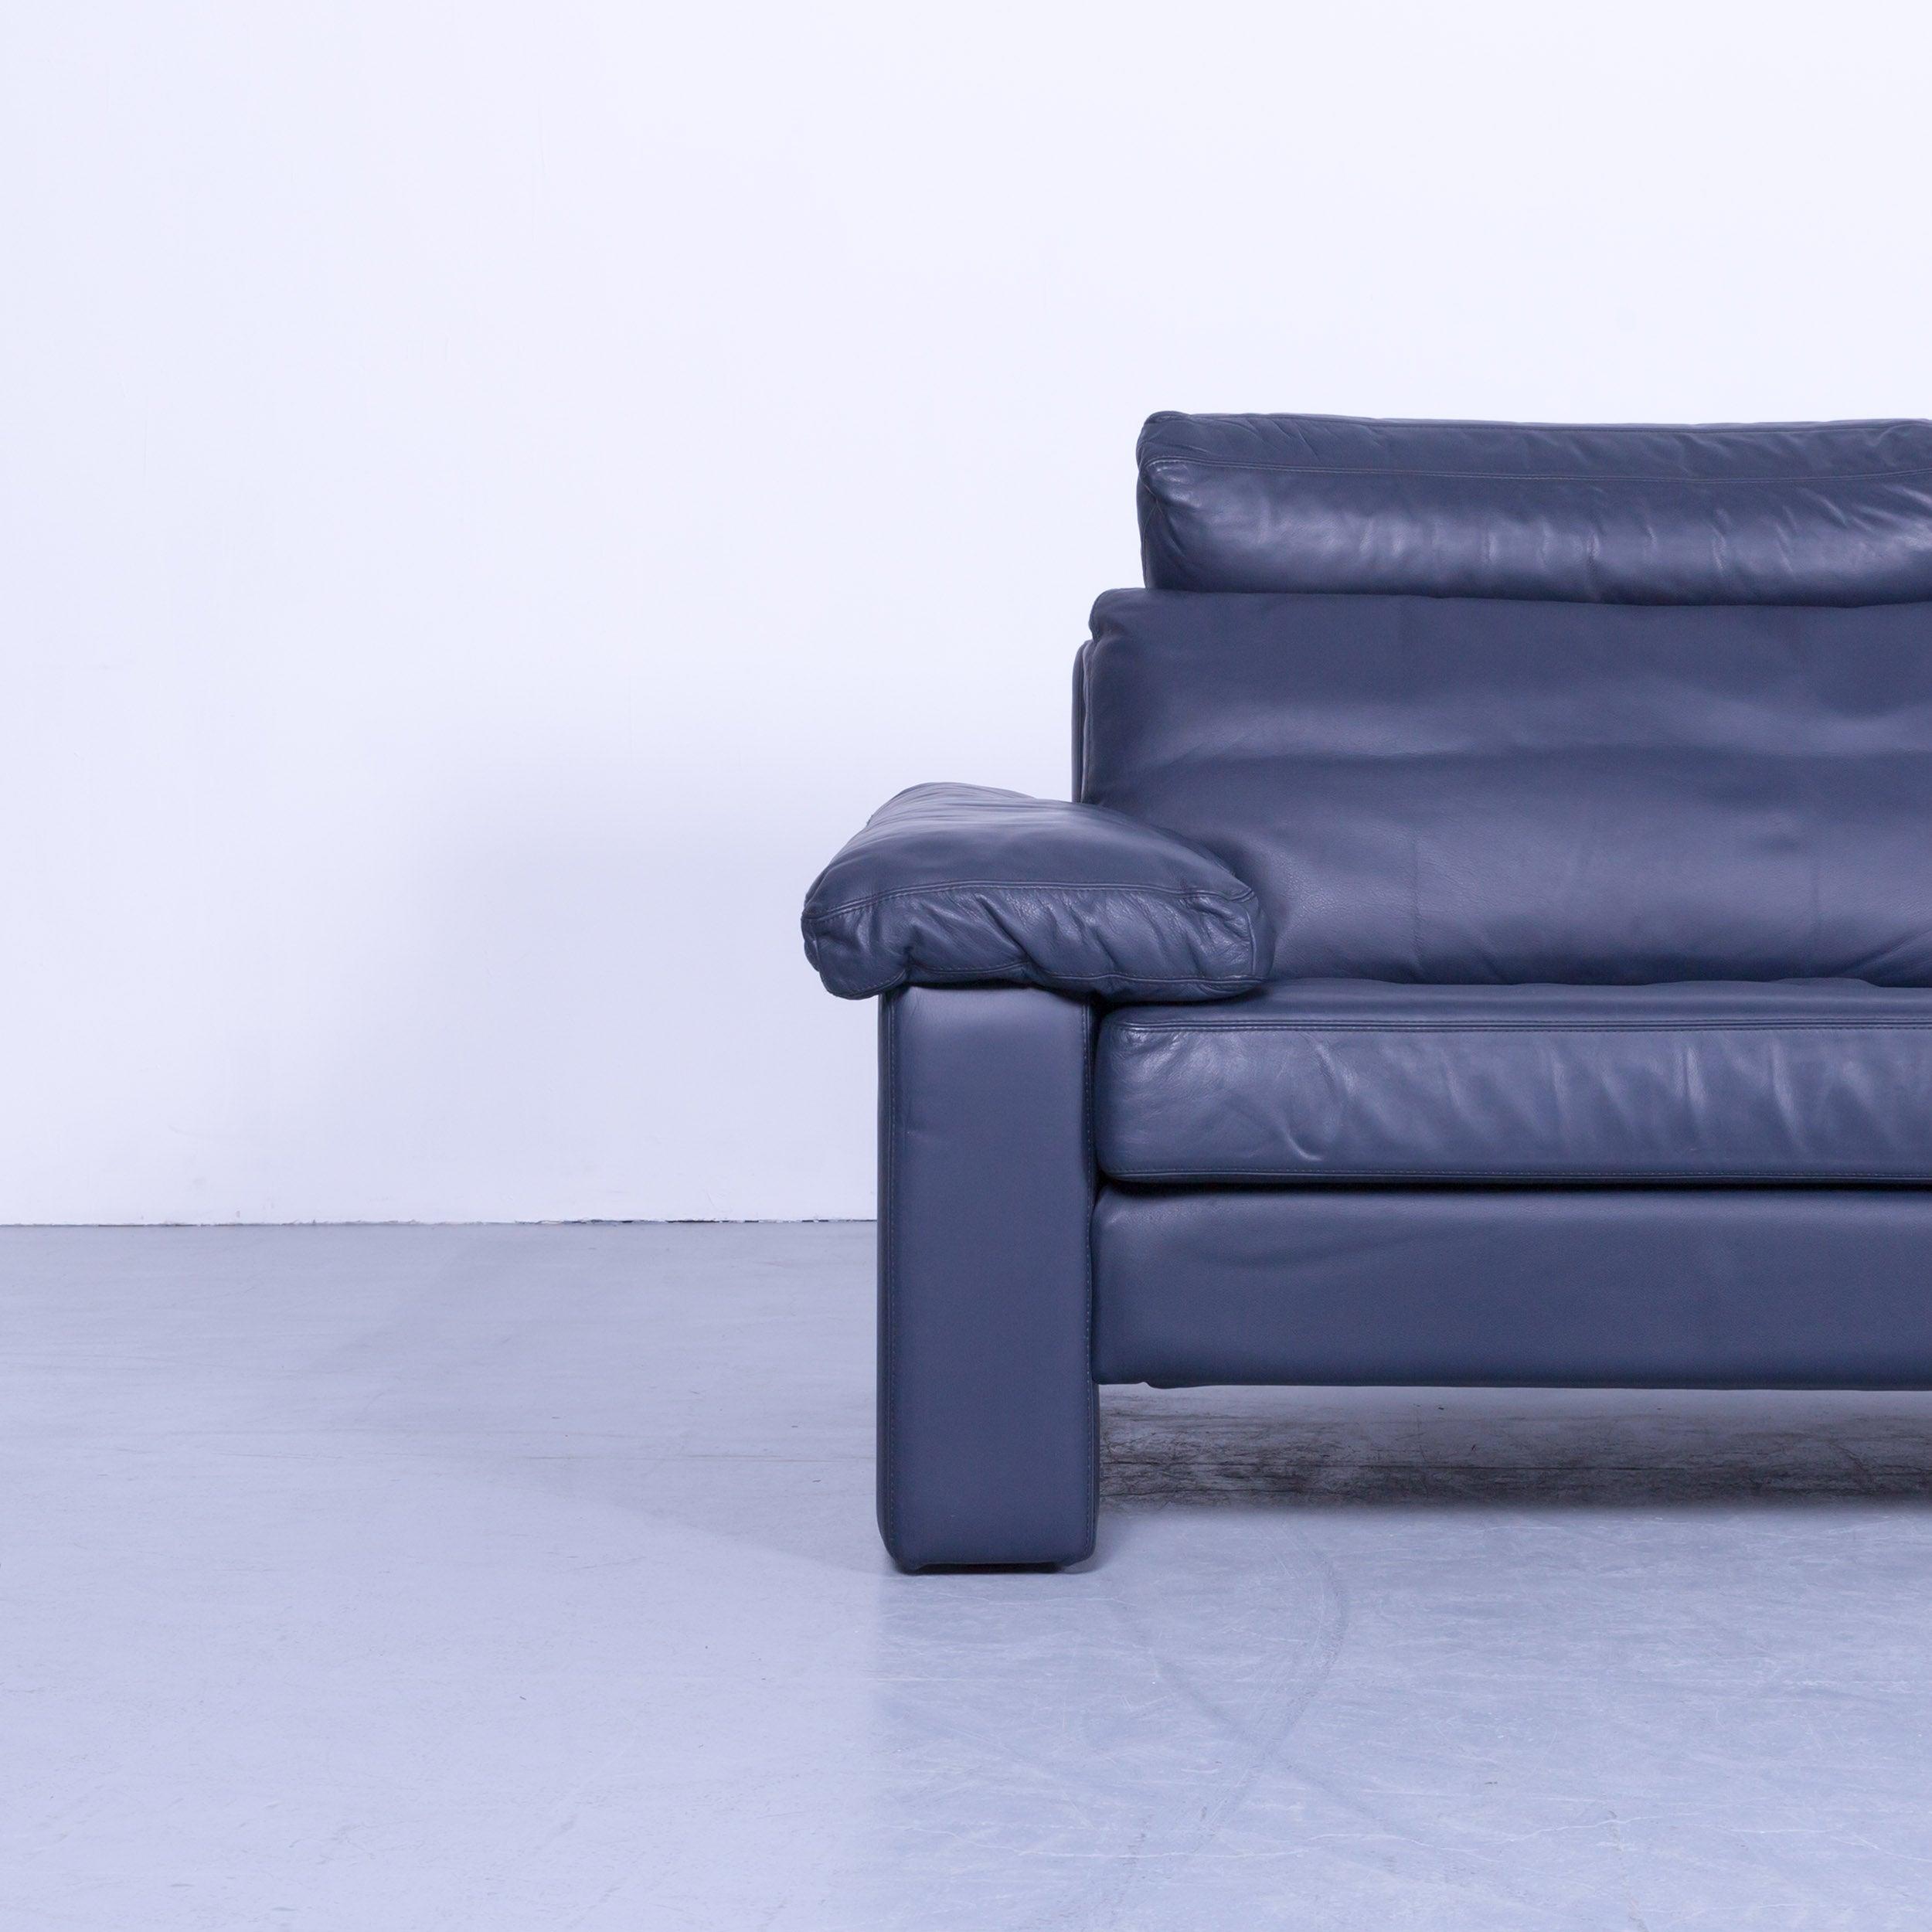 Cor Conseta Designer Sofa Leather Blue Three Seat Couch Modern At